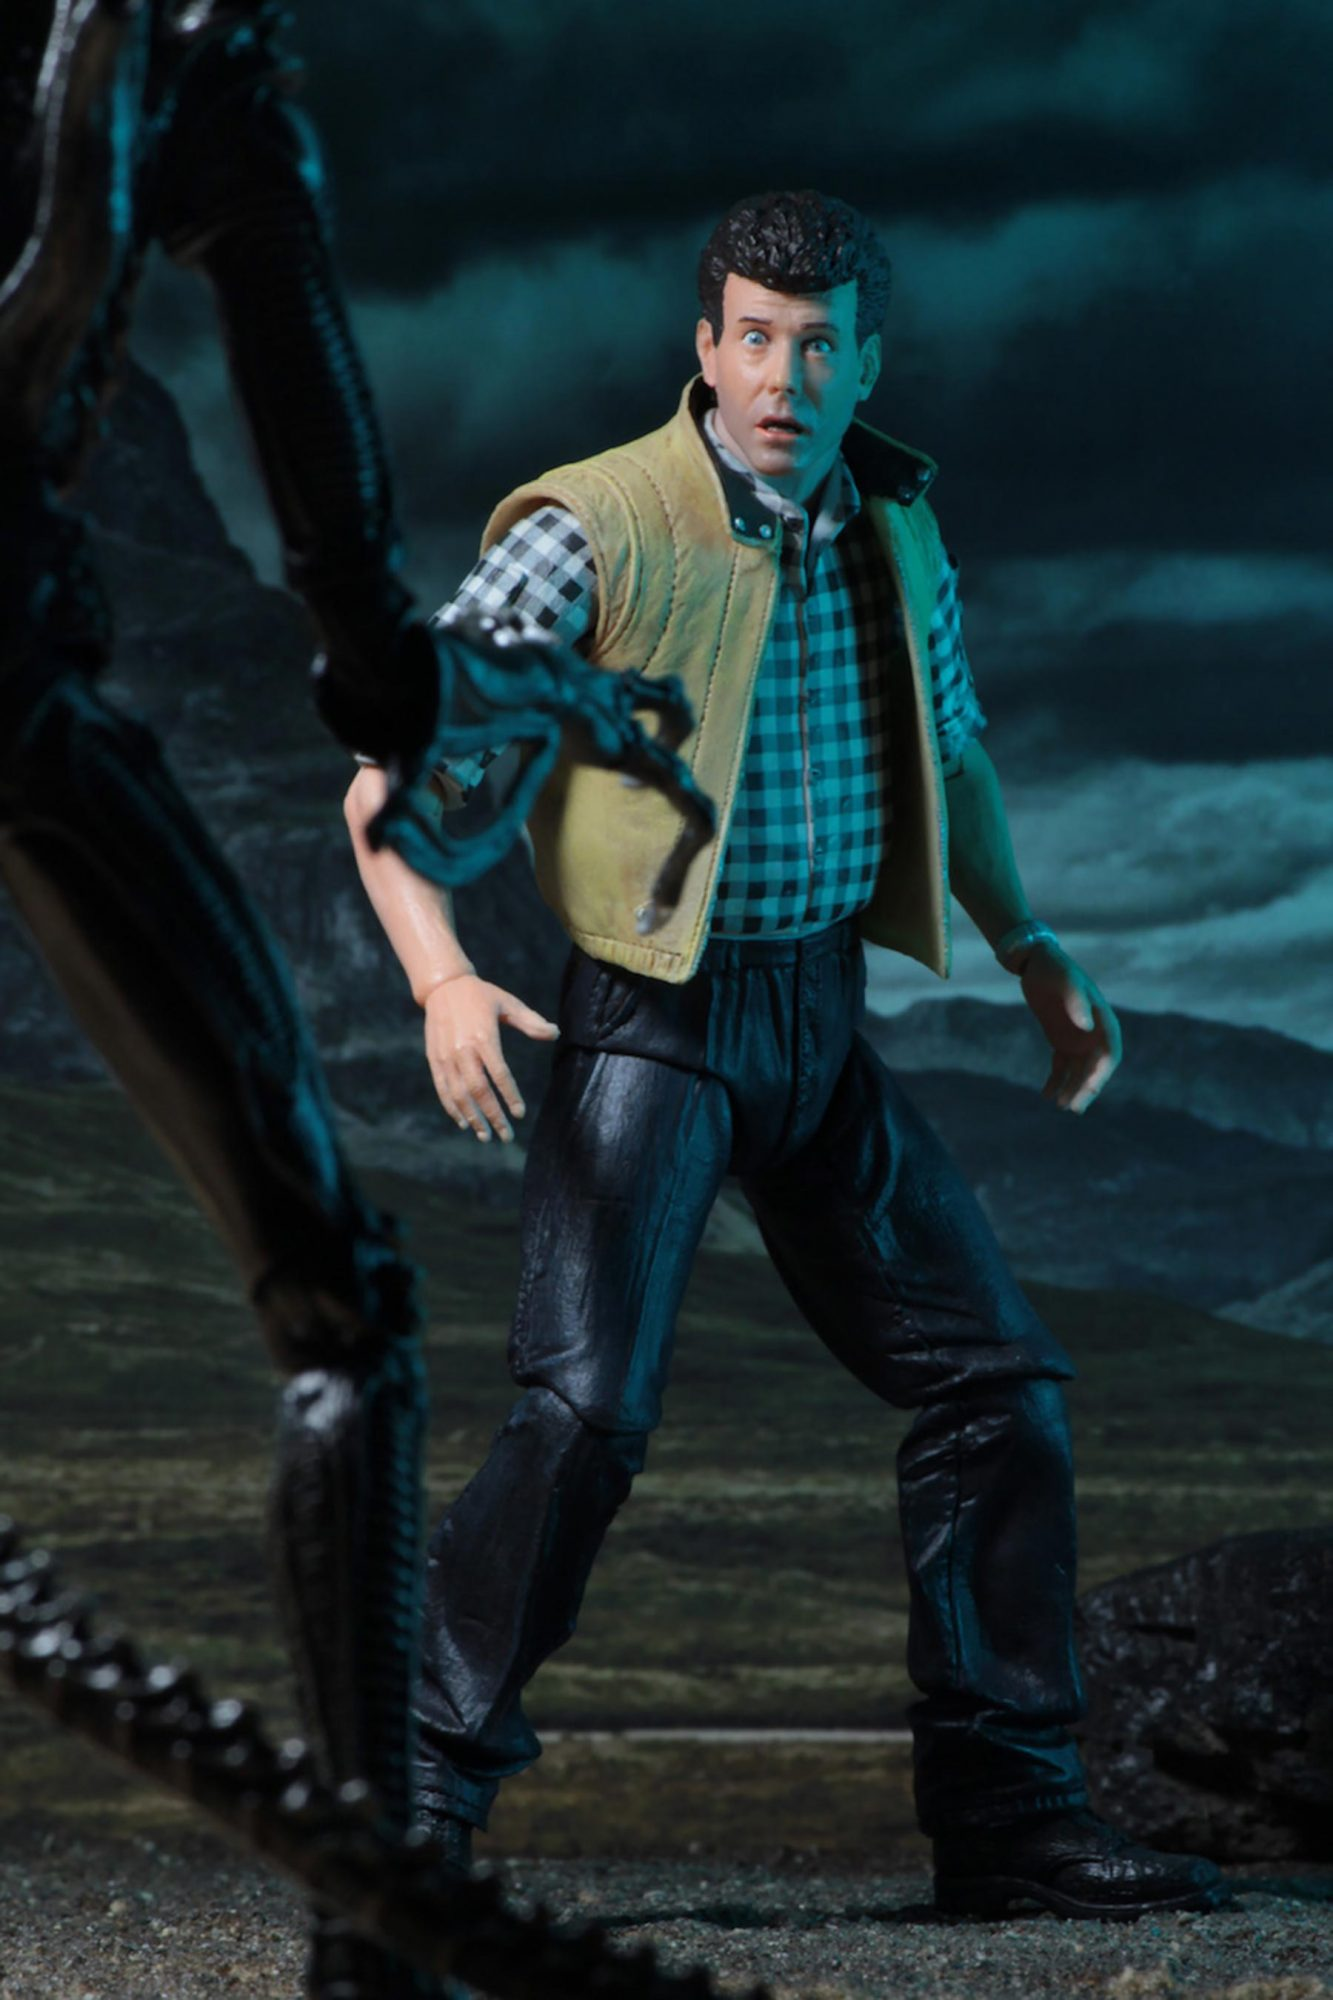 Paul Reiser Aliens action figure CR: NECA